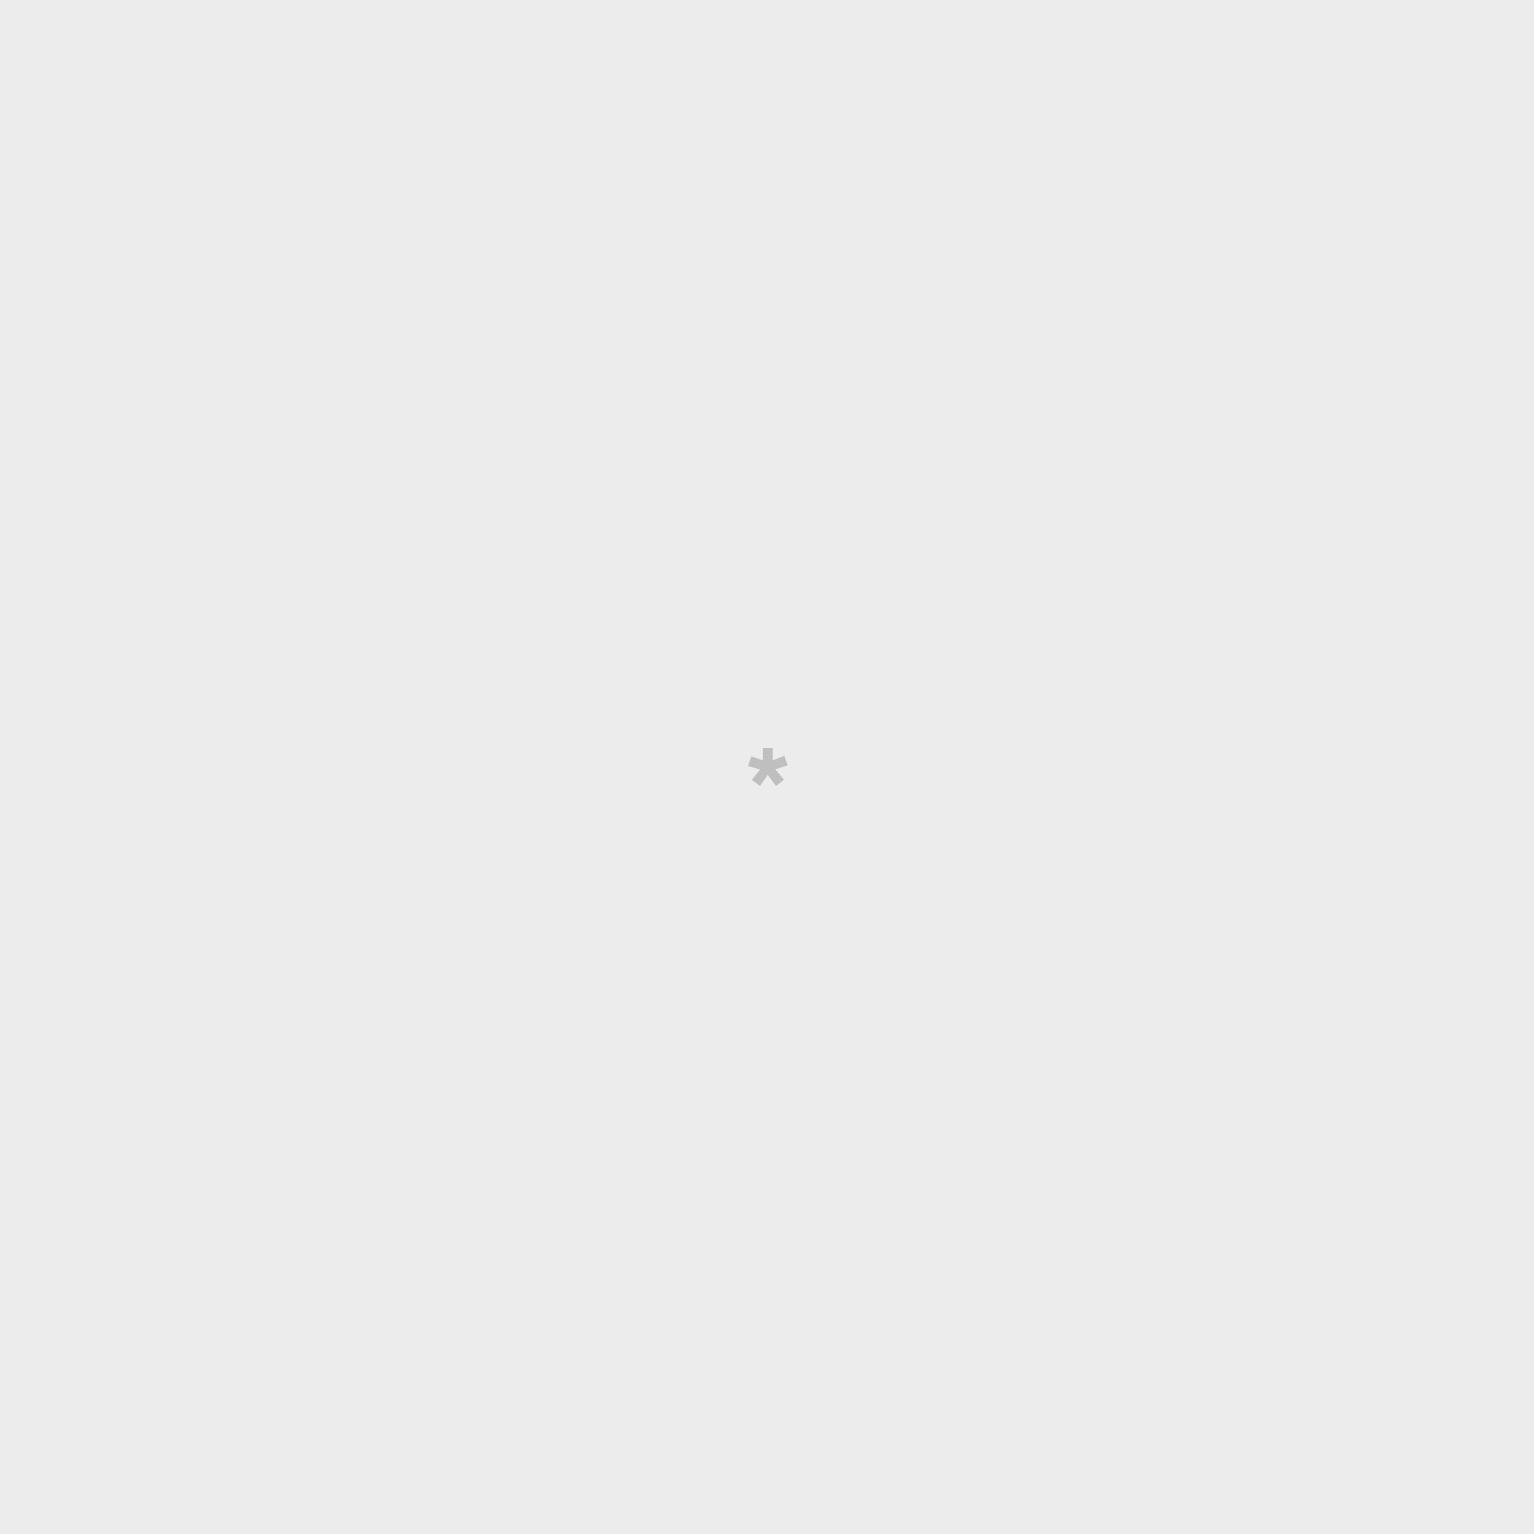 Funda de pasaporte - ¡Hola, nuevo lugar favorito!